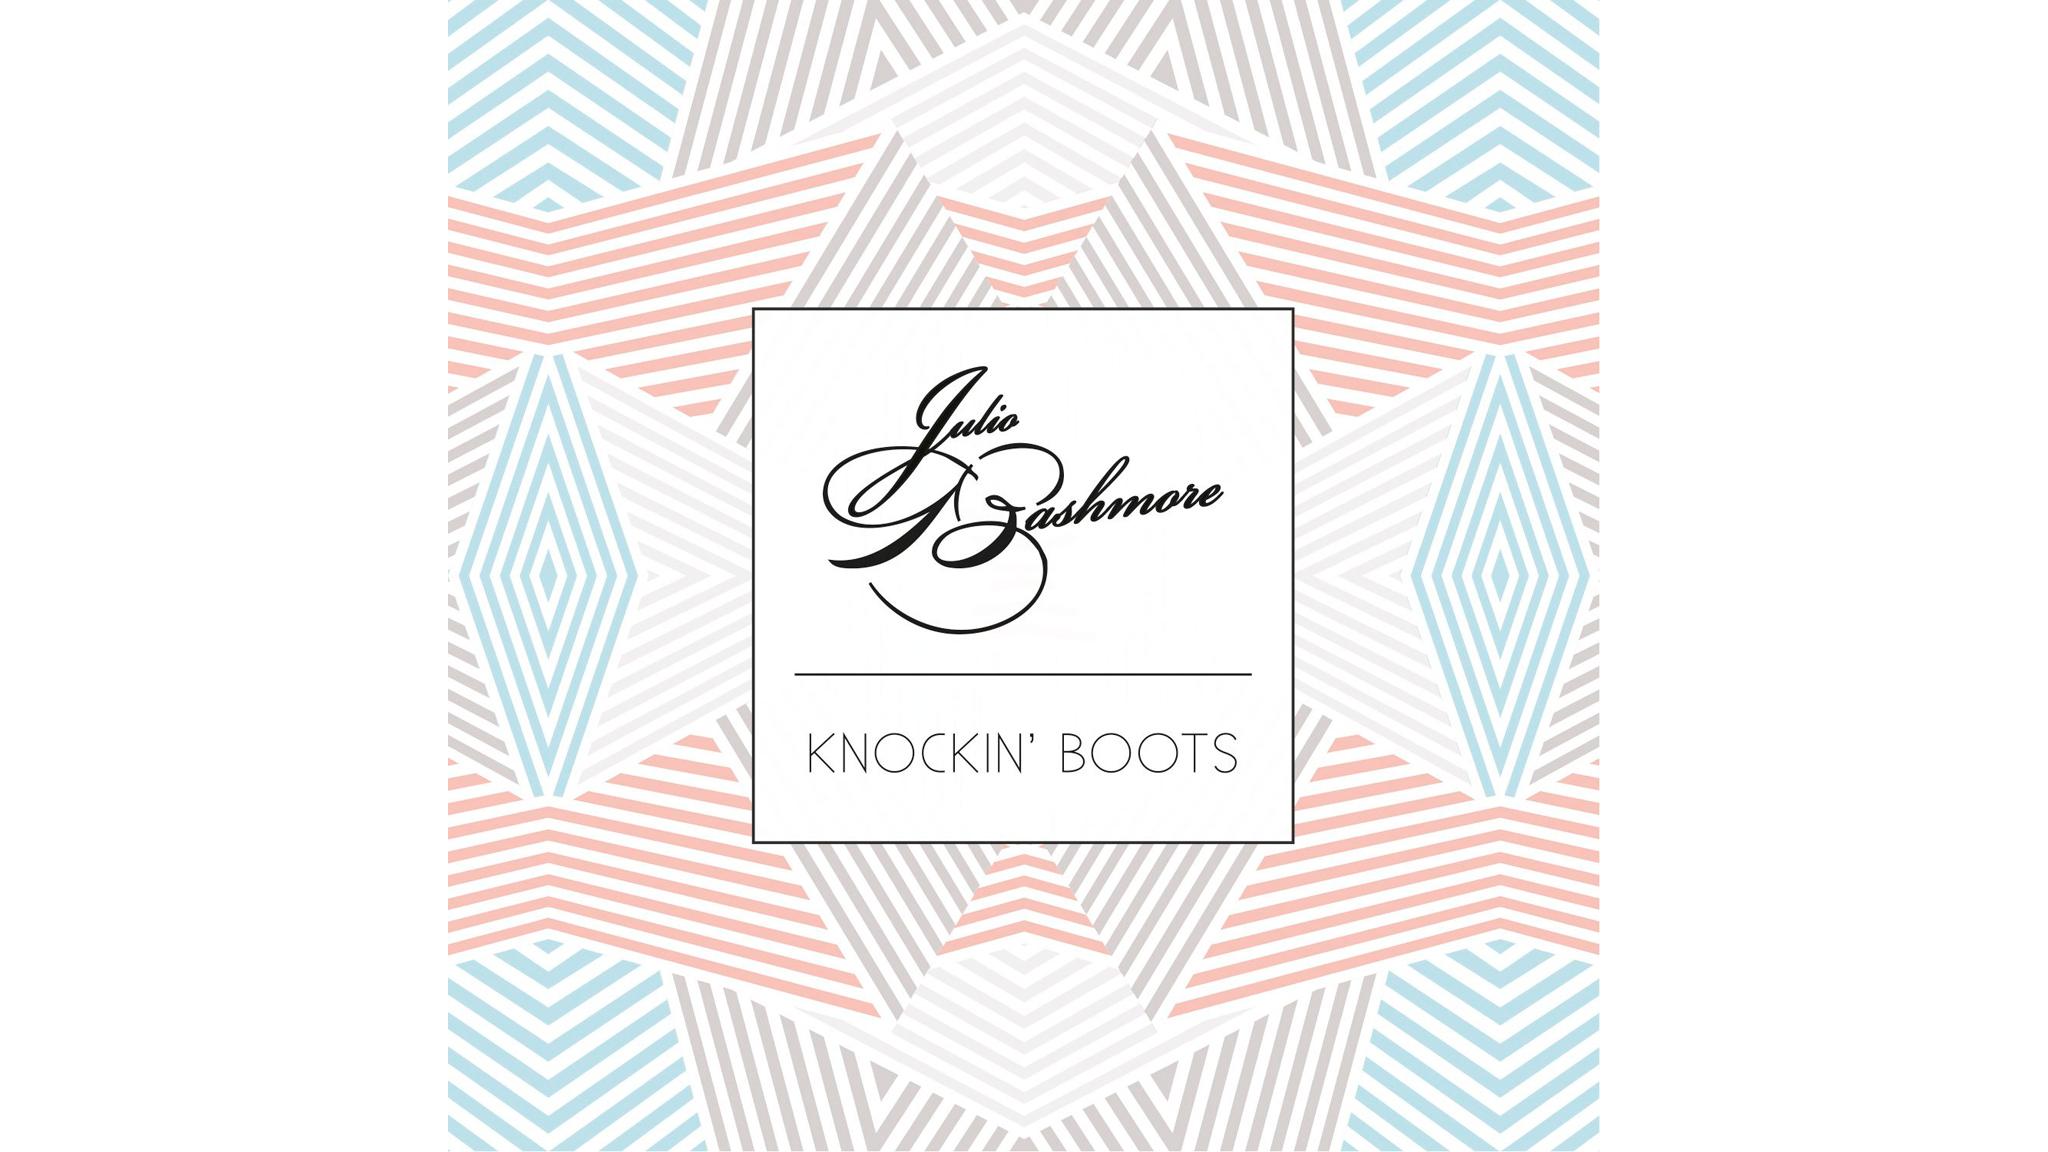 Julio Bashmore – 'Knockin' Boots'